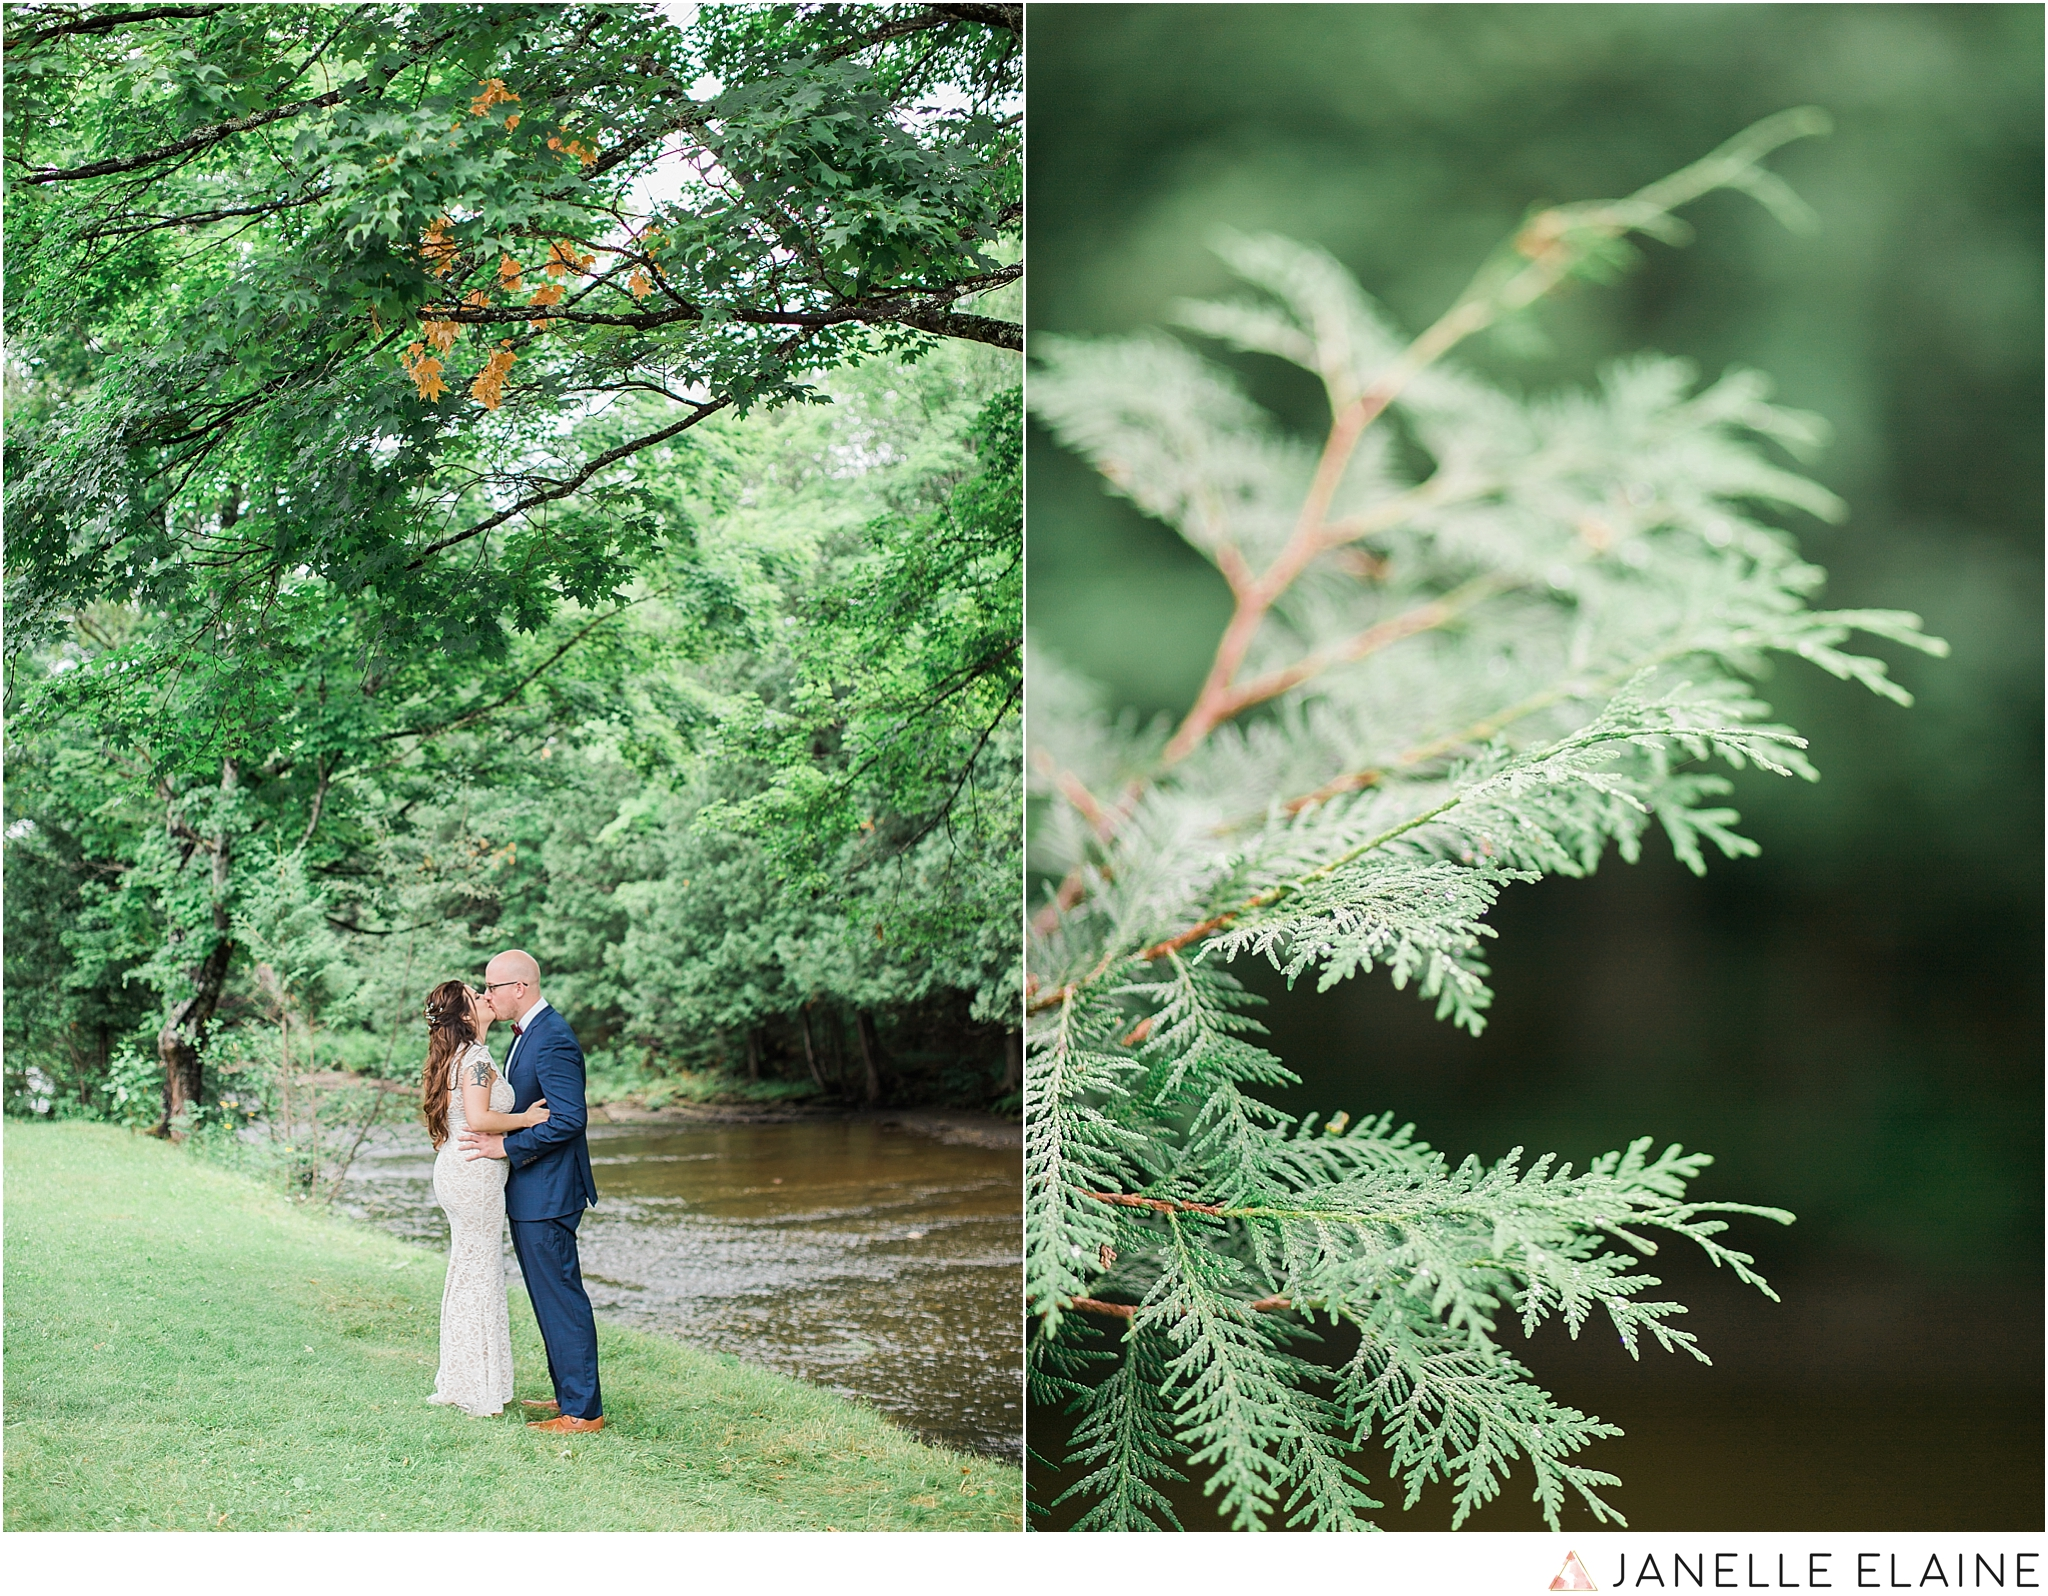 janelle elaine photography-seattle-destination-wedding-photographer-21.jpg